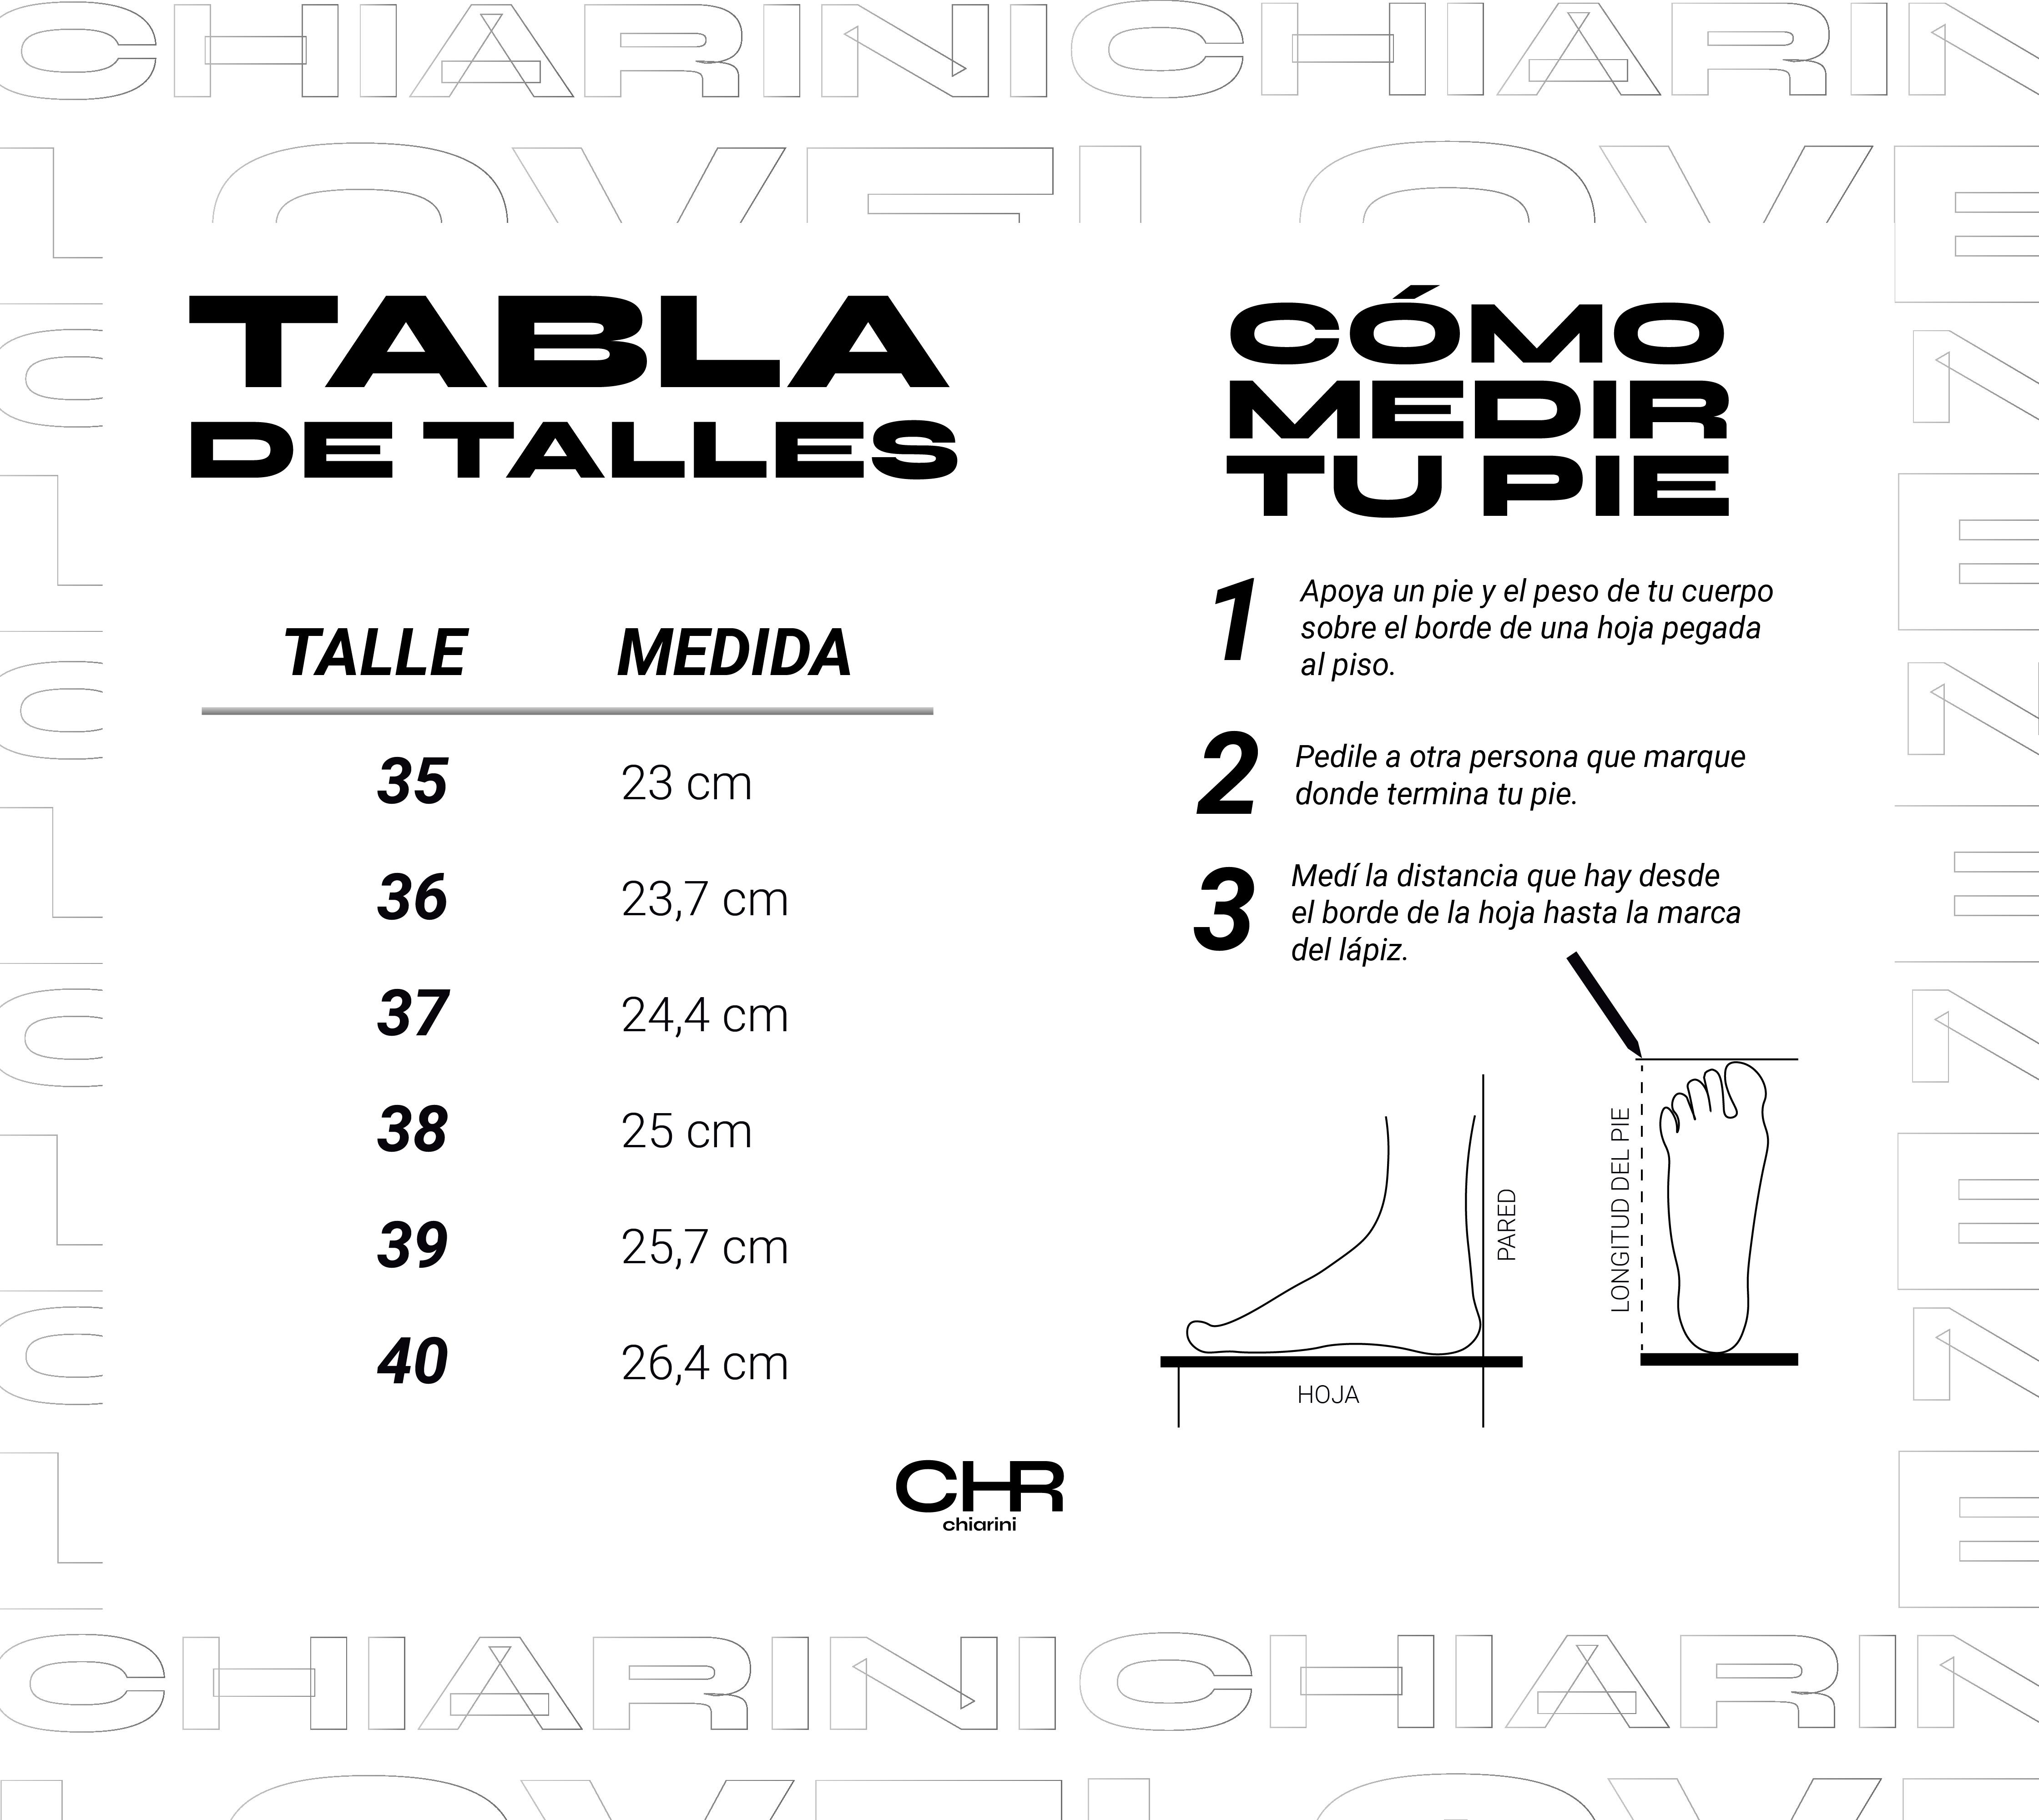 tabla de talle